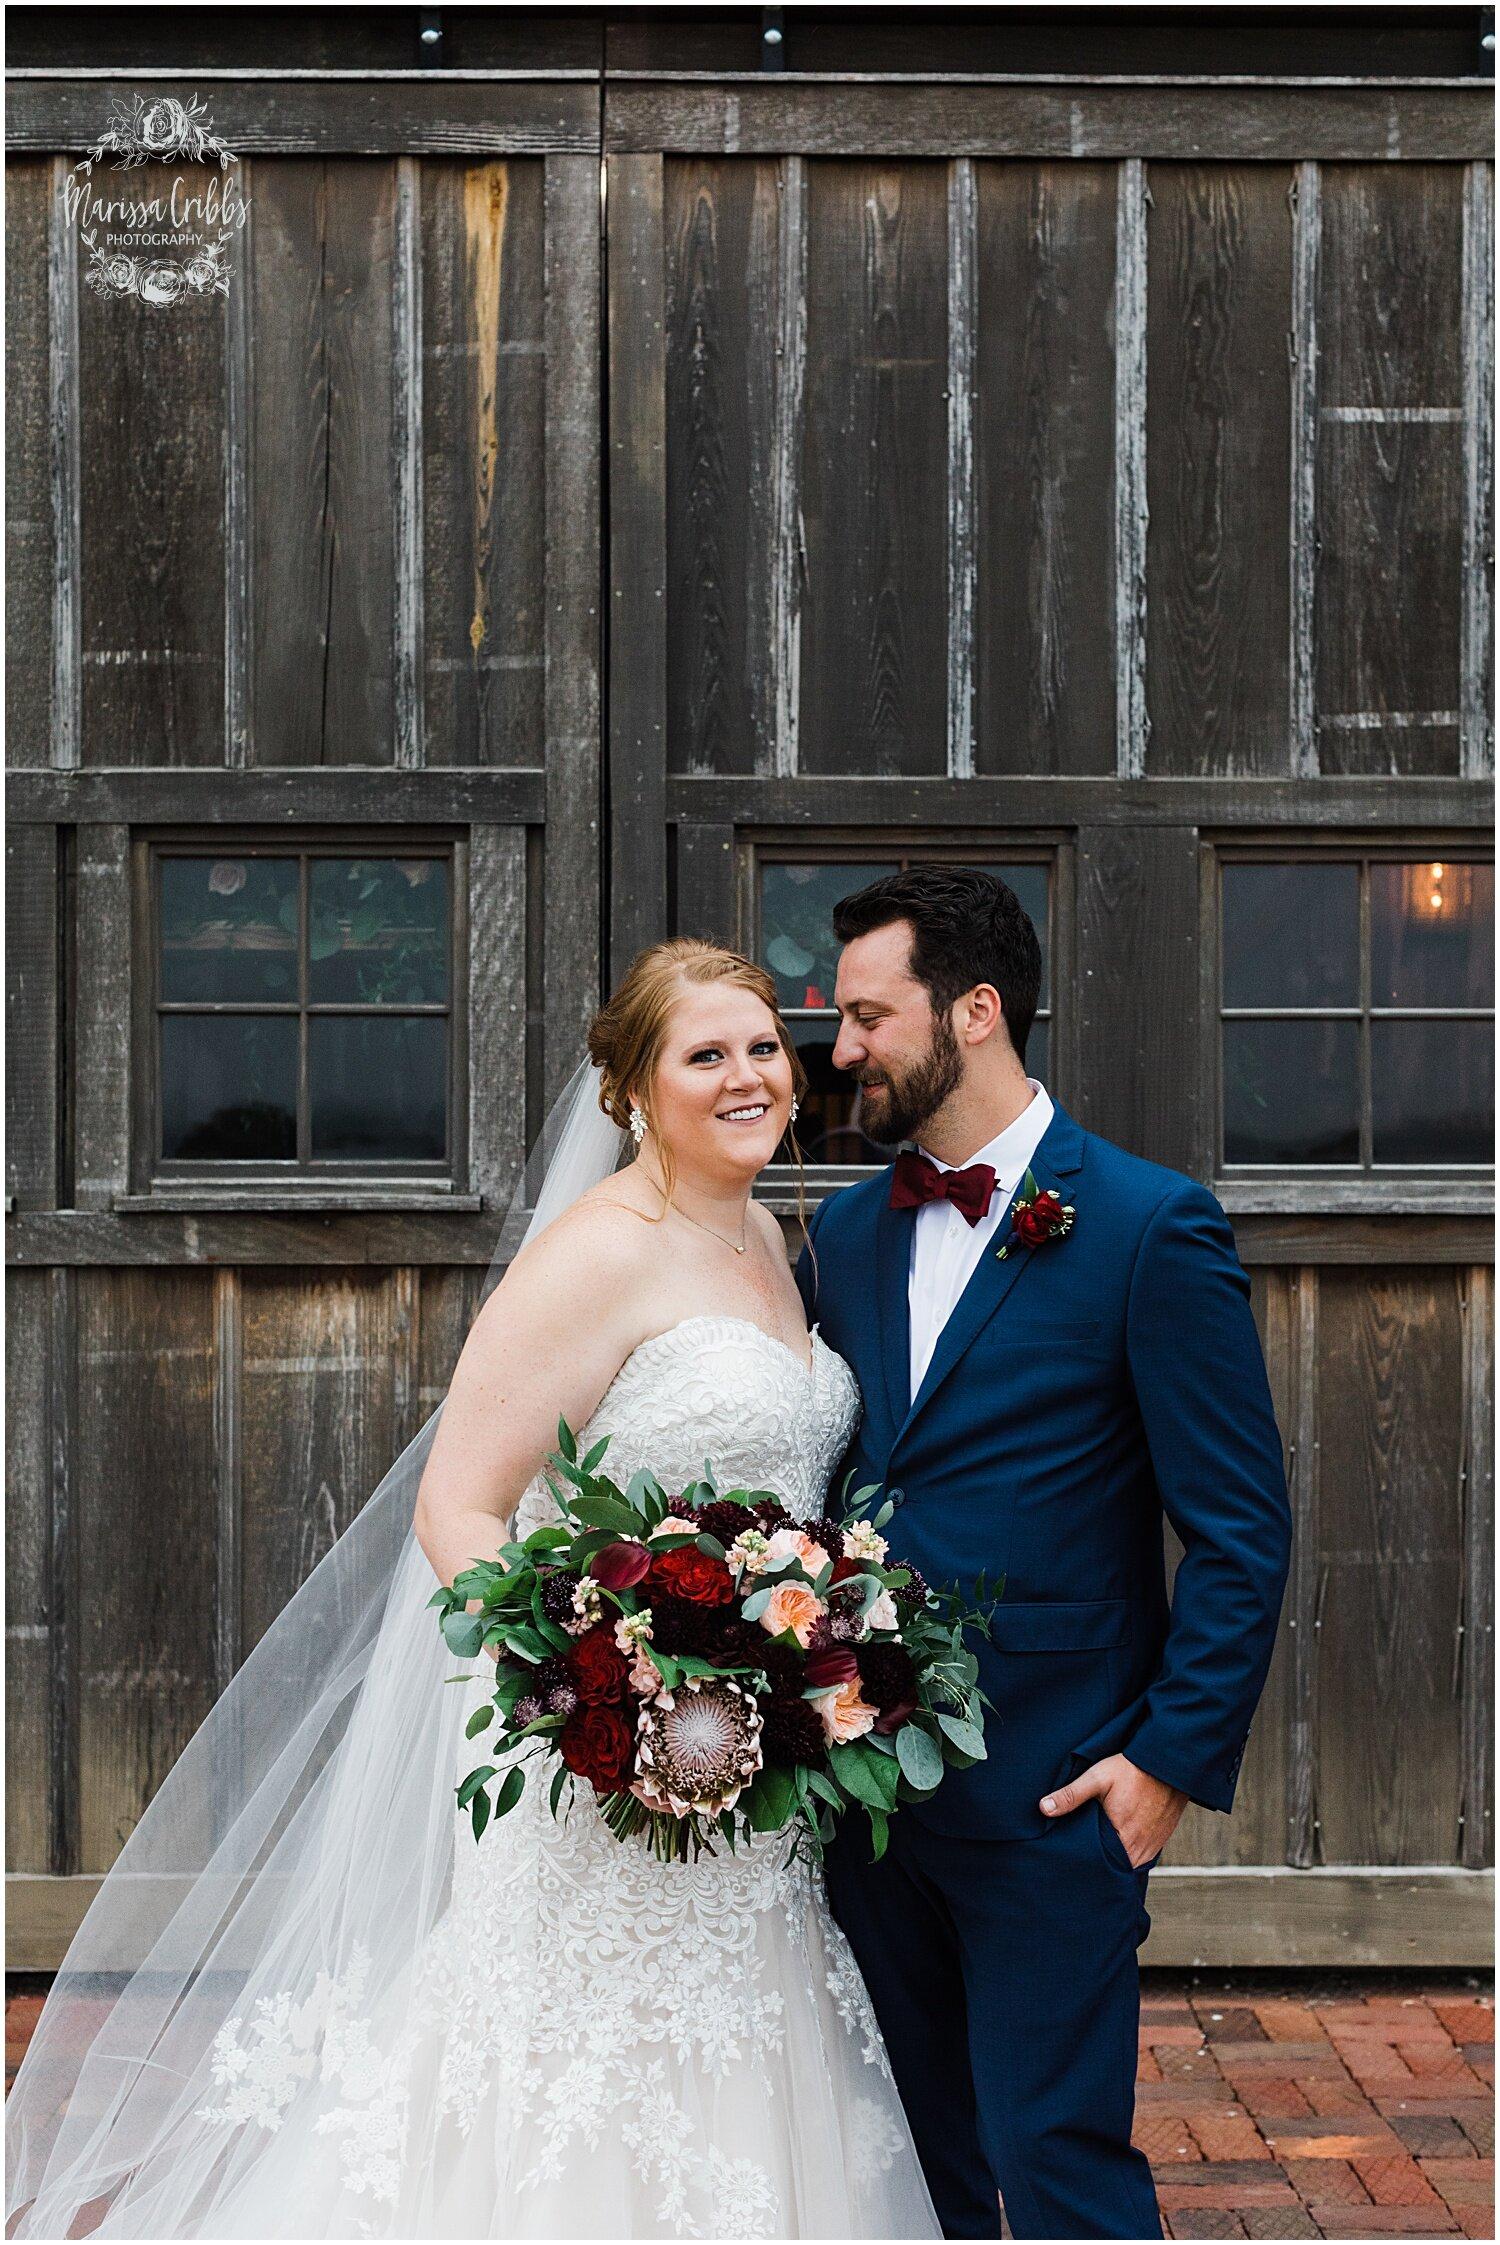 ANNA & LUKE MARRIED BLOG | MARISSA CRIBBS PHOTOGRAPHY | WESTON RED BARN FARM_9423.jpg